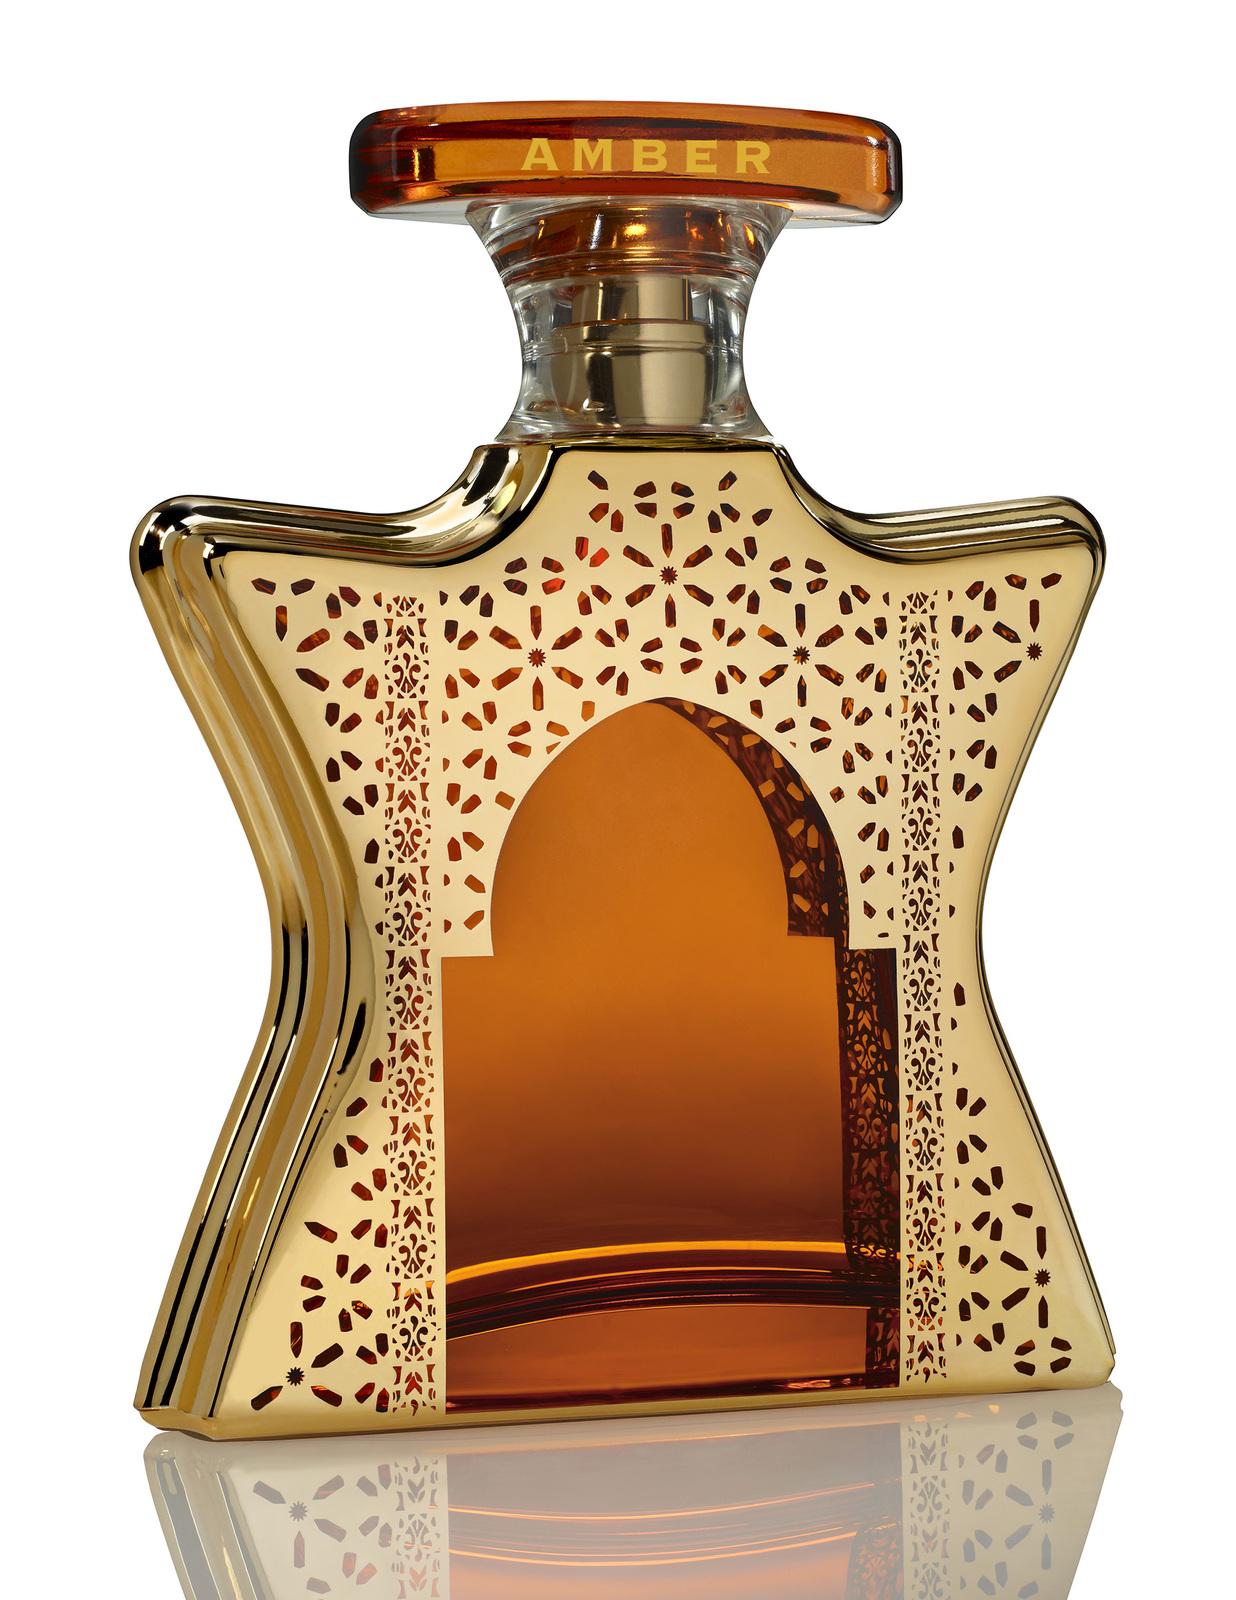 DUBAI AMBER by BOND No.9 5ml TRAVEL SPRAY Rasberry Gaiac Saffron Cedar PARFUM